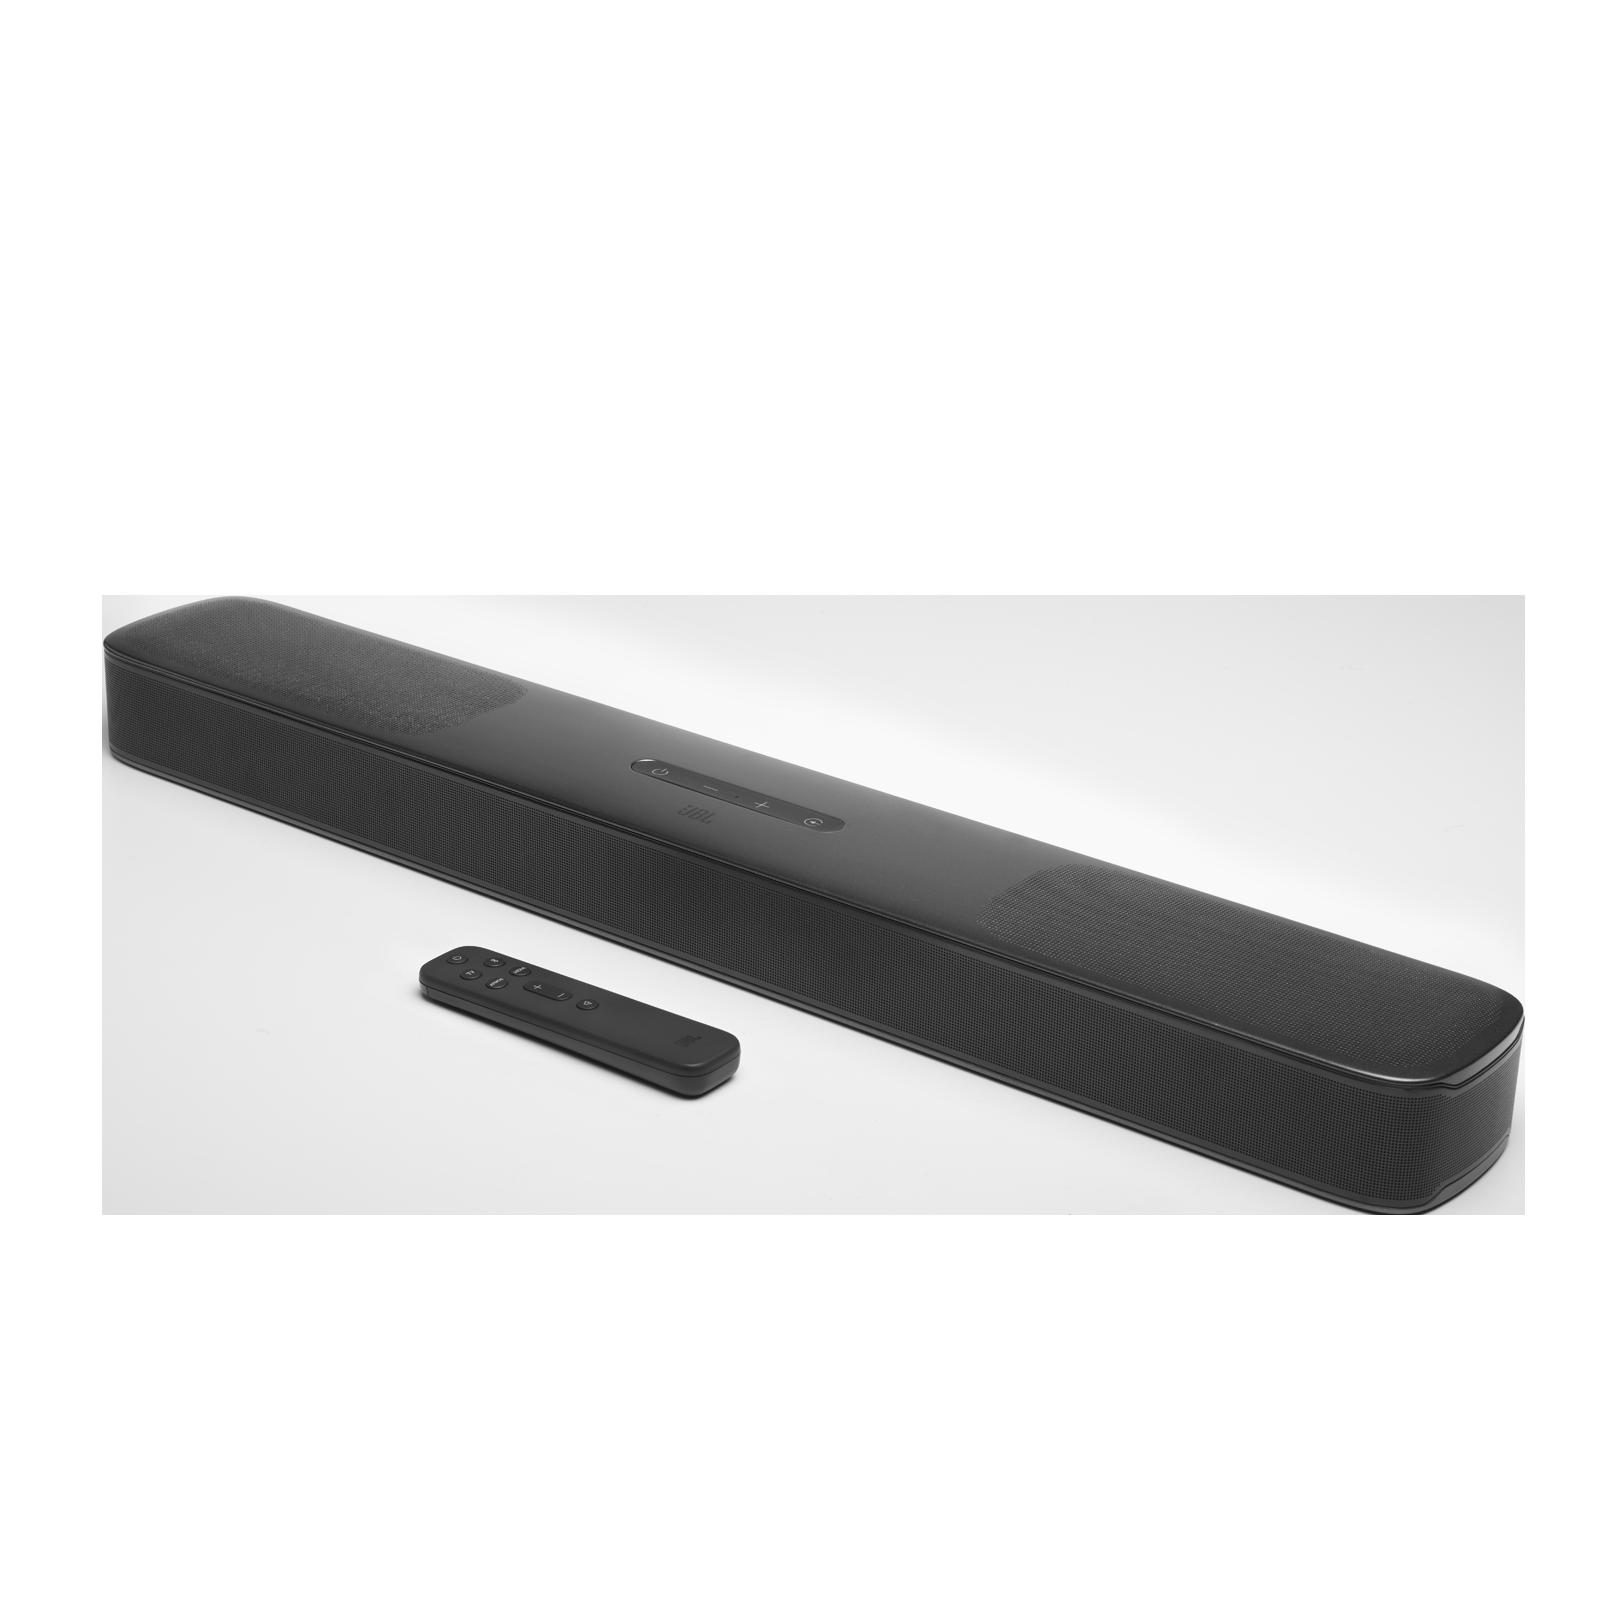 Bar 5.0 MultiBeam - Grey - 5.0 channel soundbar with MultiBeam™ technology and Virtual Dolby Atmos® - Hero